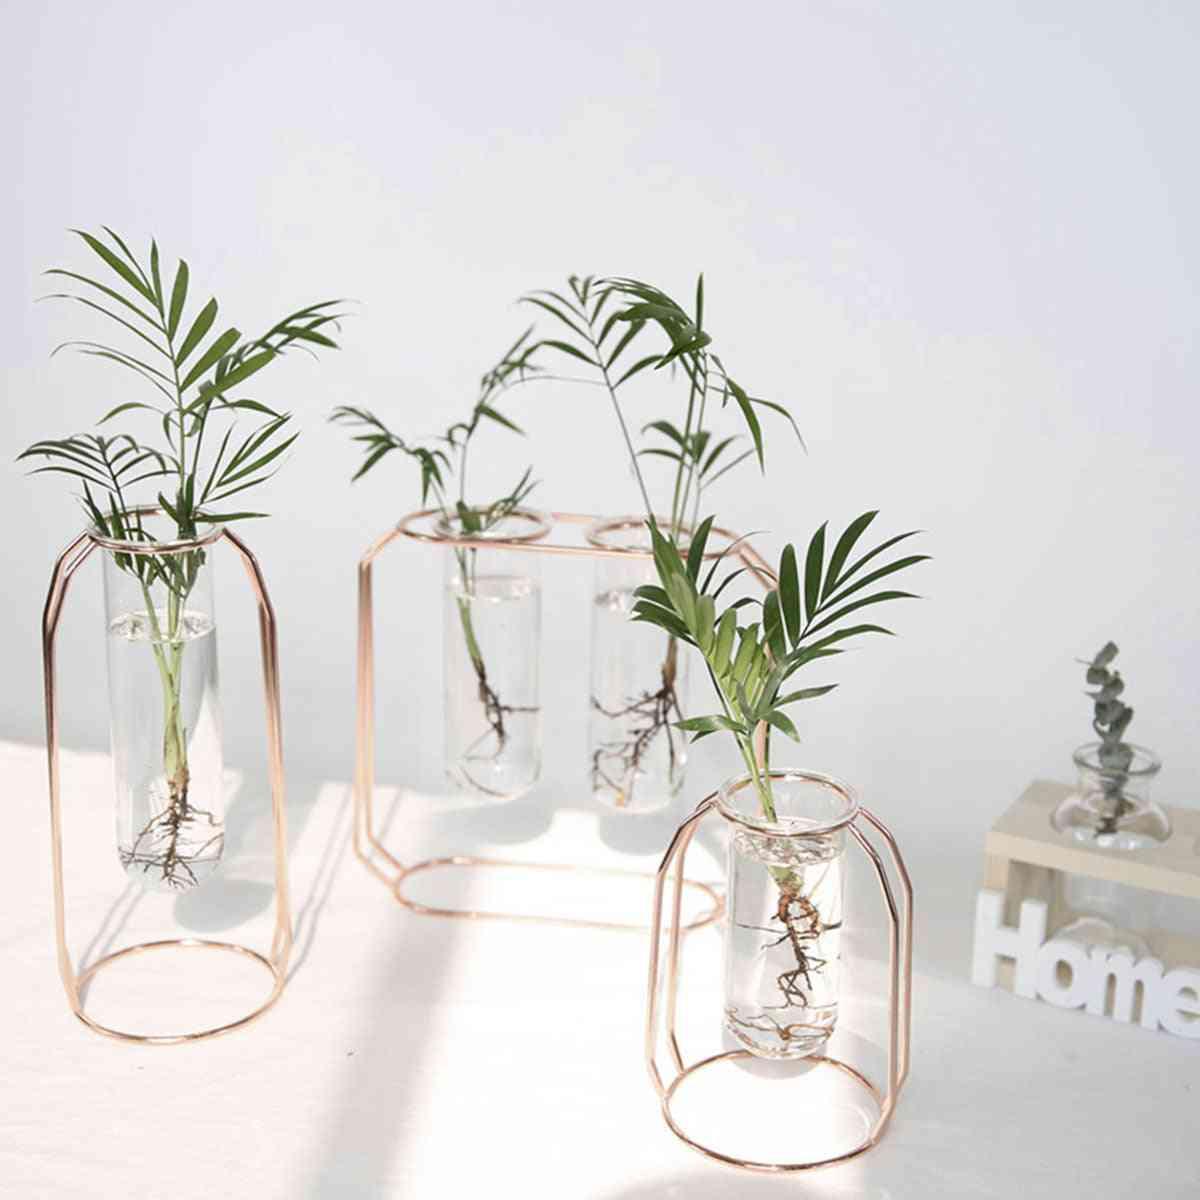 Nordic Golden Glass Vase - Iron Hydroponic Plant Tabletop Flower Holder